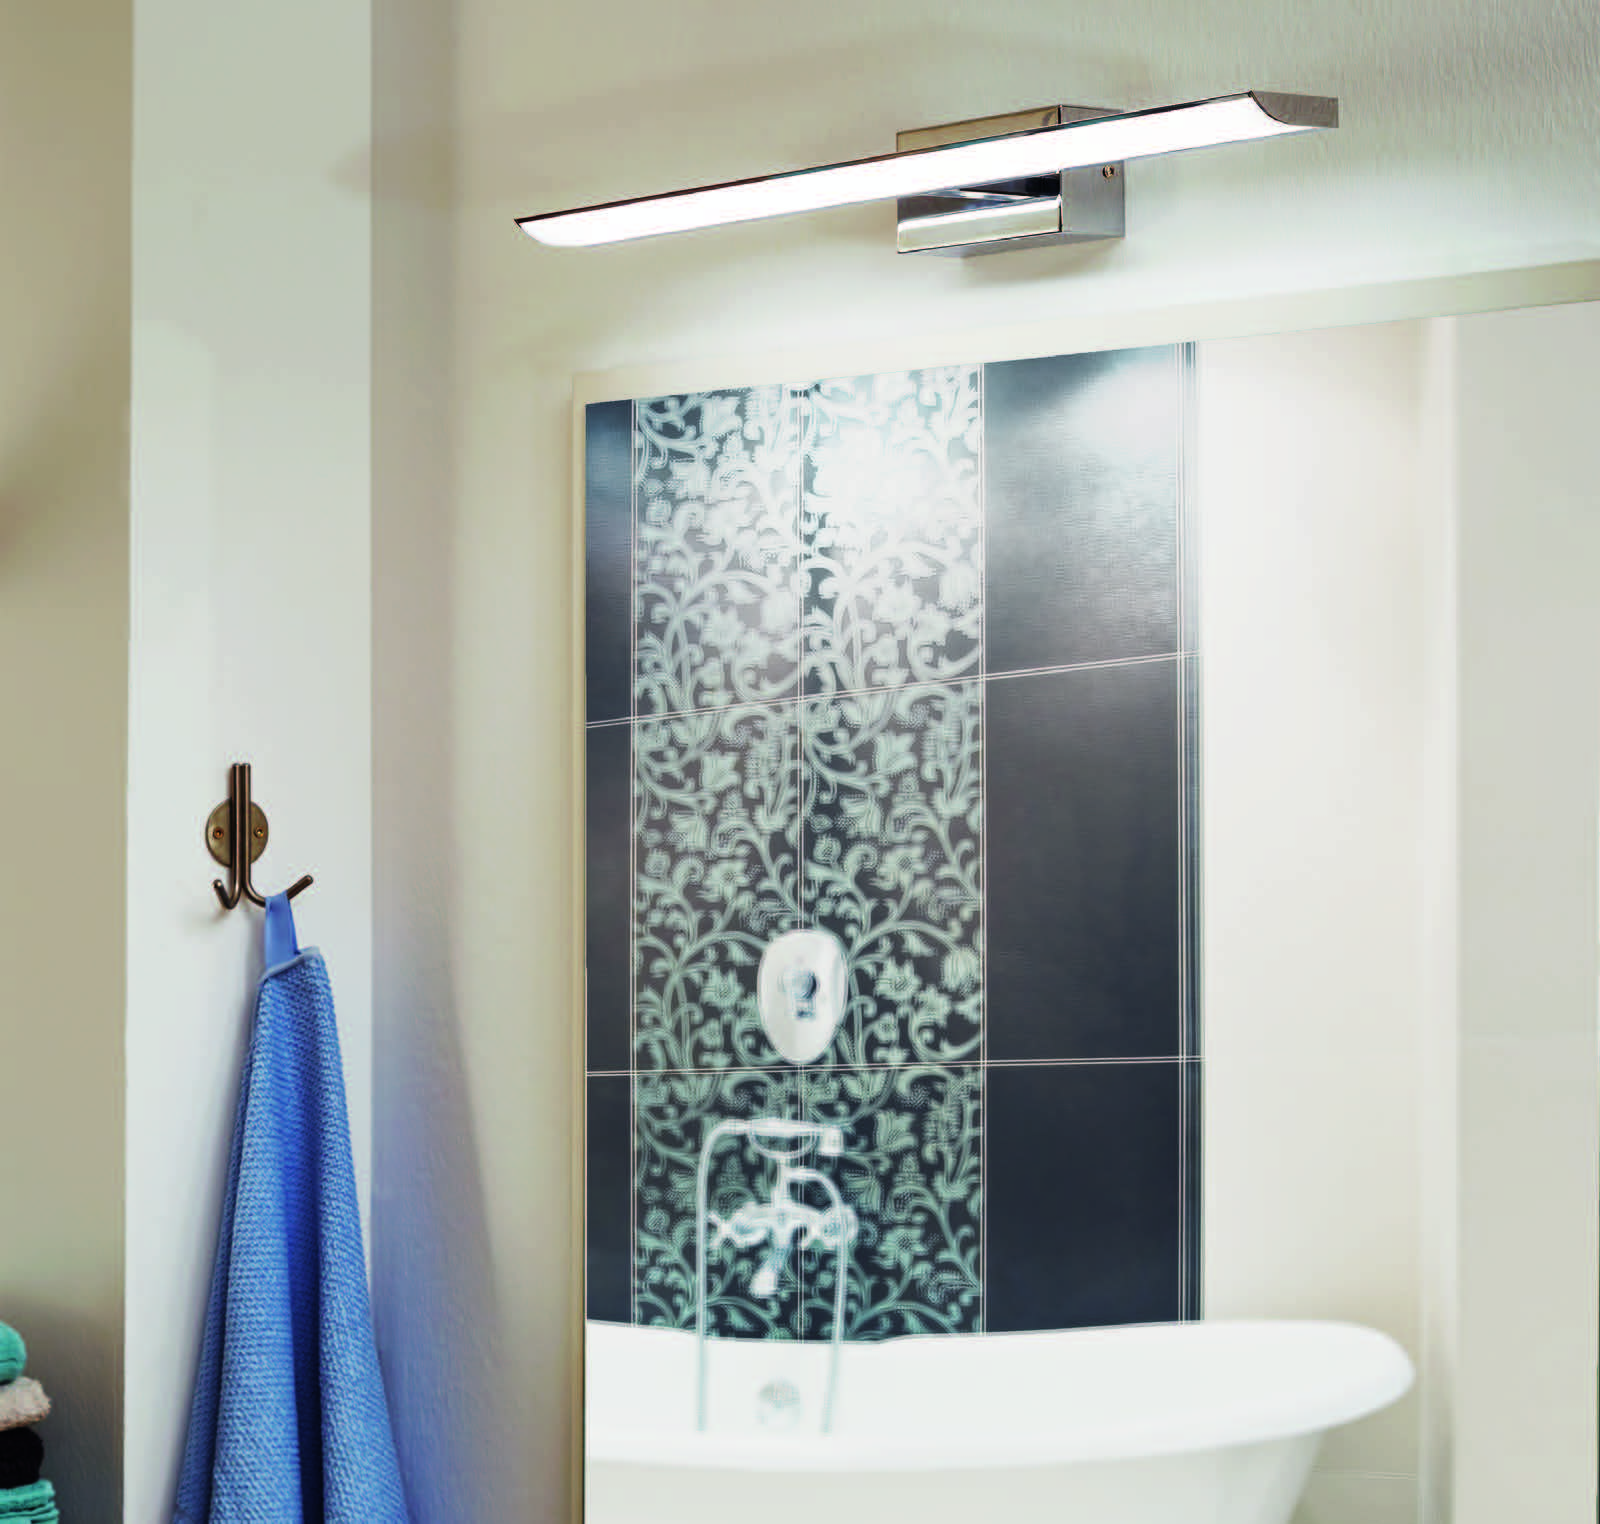 EGLO 94615 TABIANO svítidlo nad zrcadlodo koupelny